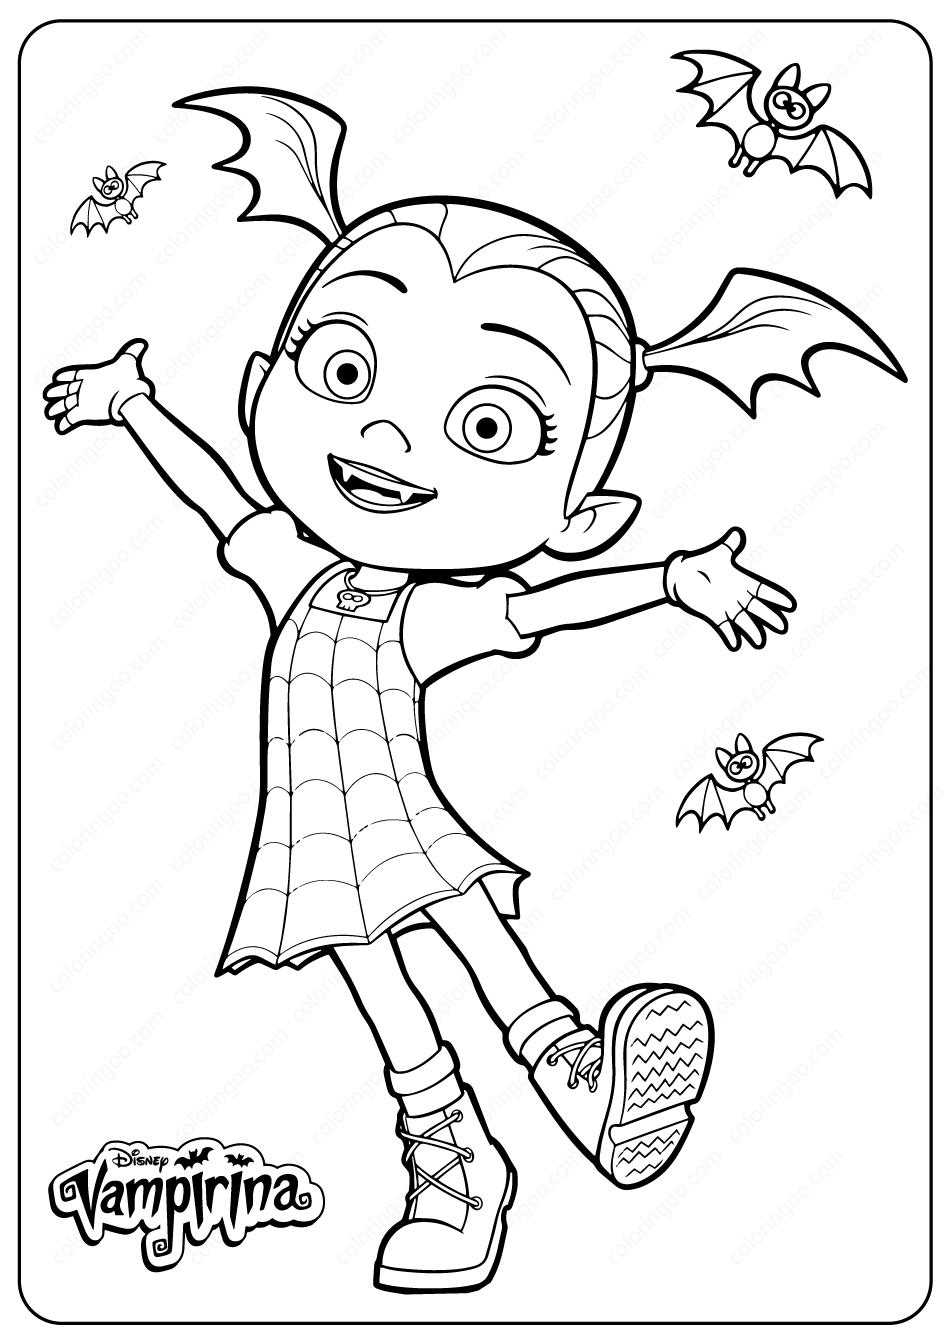 Vampirina Coloring Pages Vampirina And Wolfie Free Printable Cartoon Coloring Pages Coloring Pages Printable Flower Coloring Pages